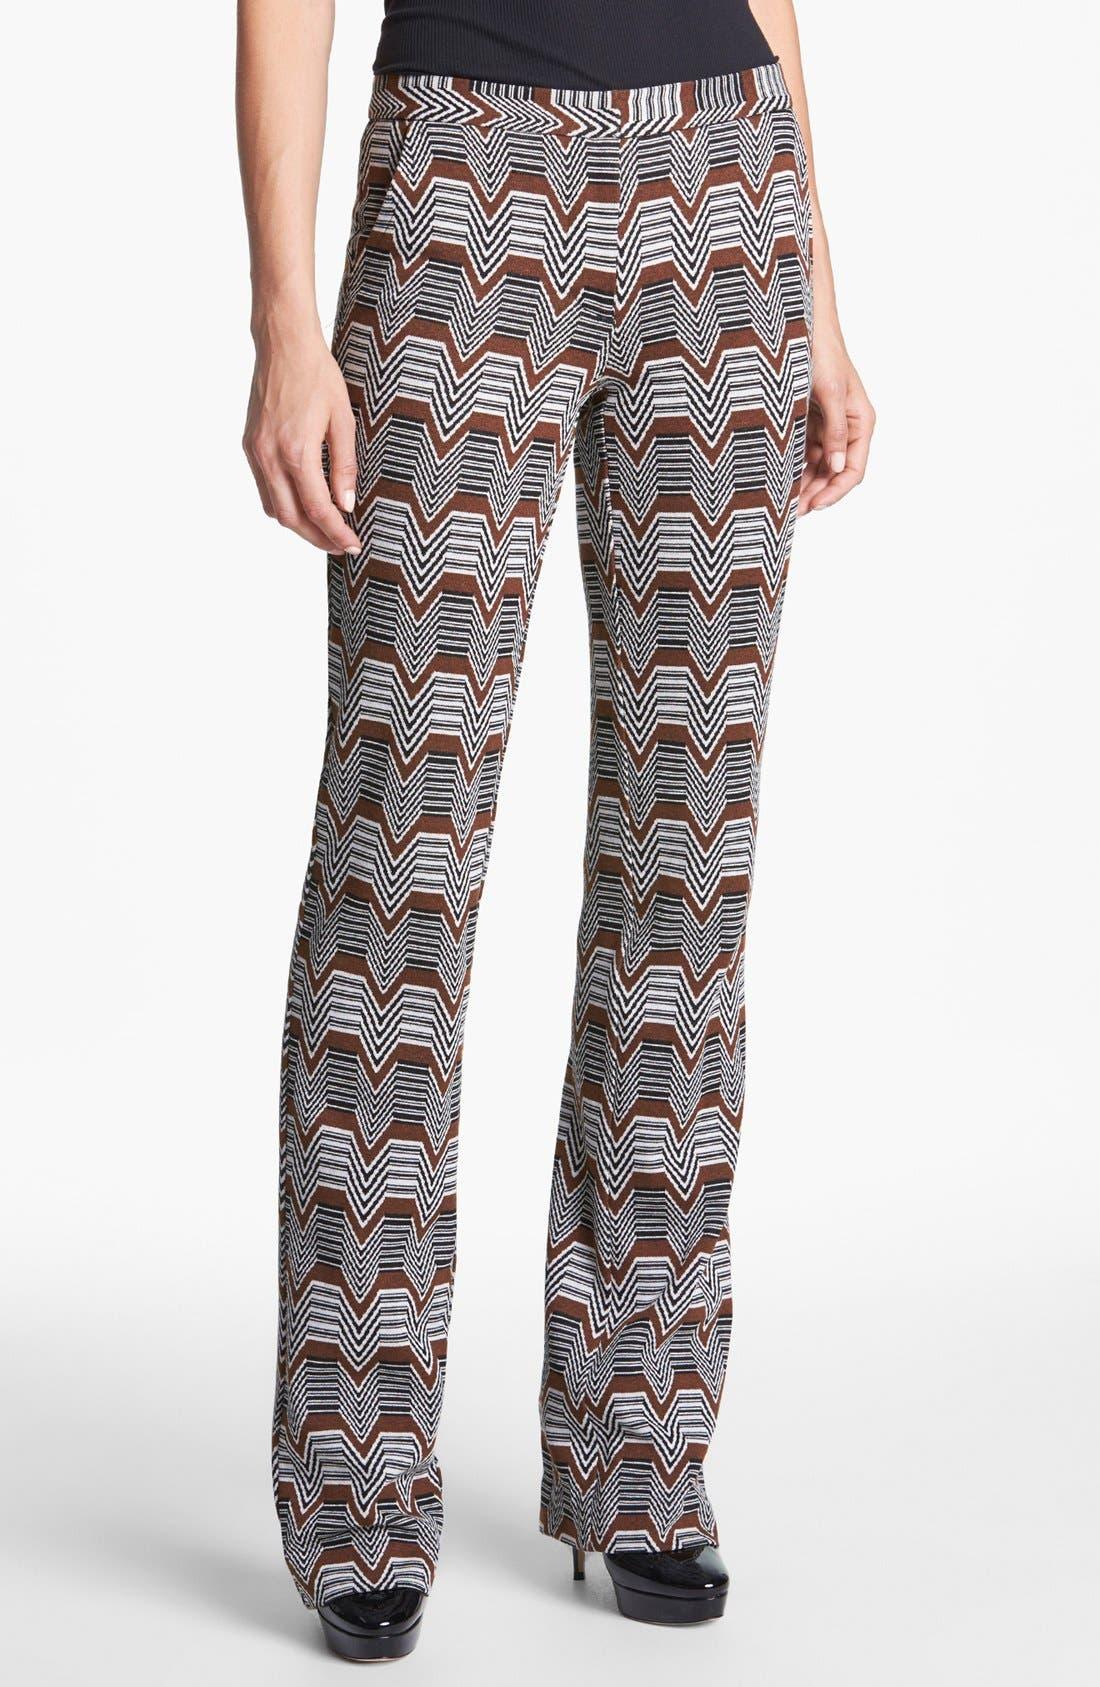 Alternate Image 1 Selected - Trina Turk 'Rocco' Jacquard Pants